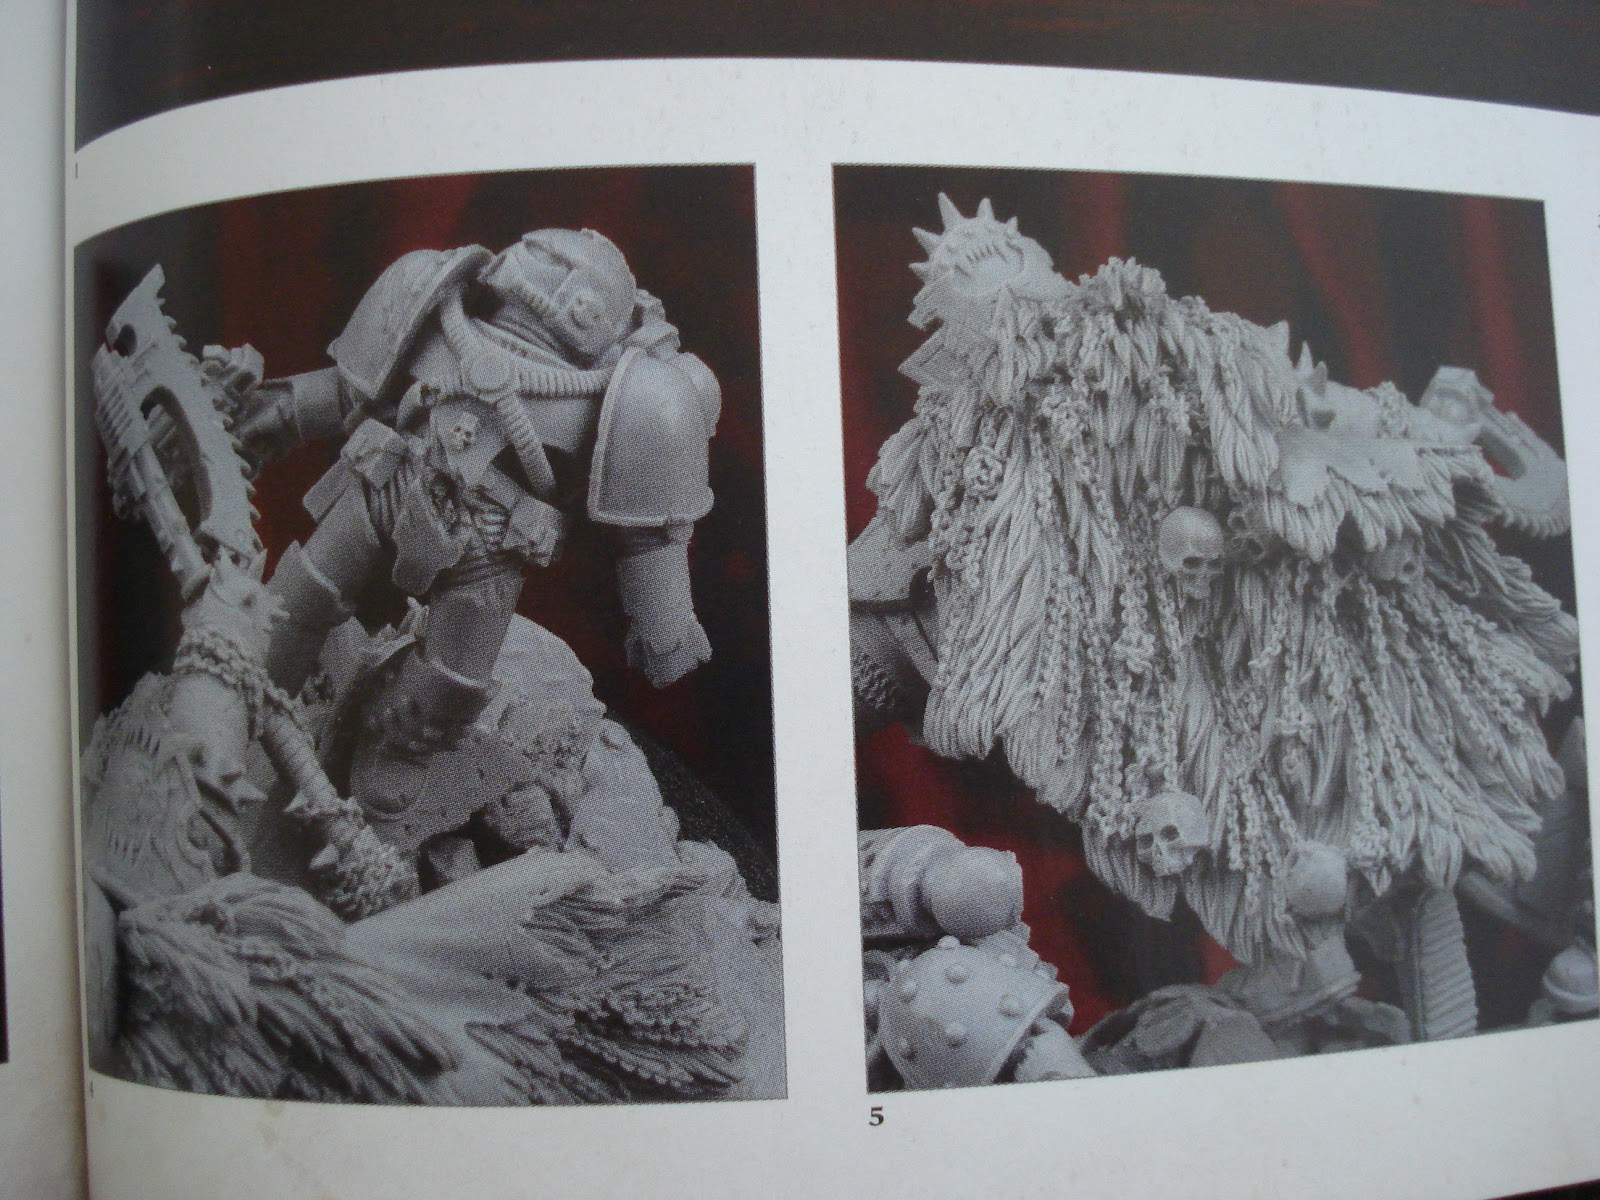 l'heresie d'Horus en FW - Page 2 DSC06361